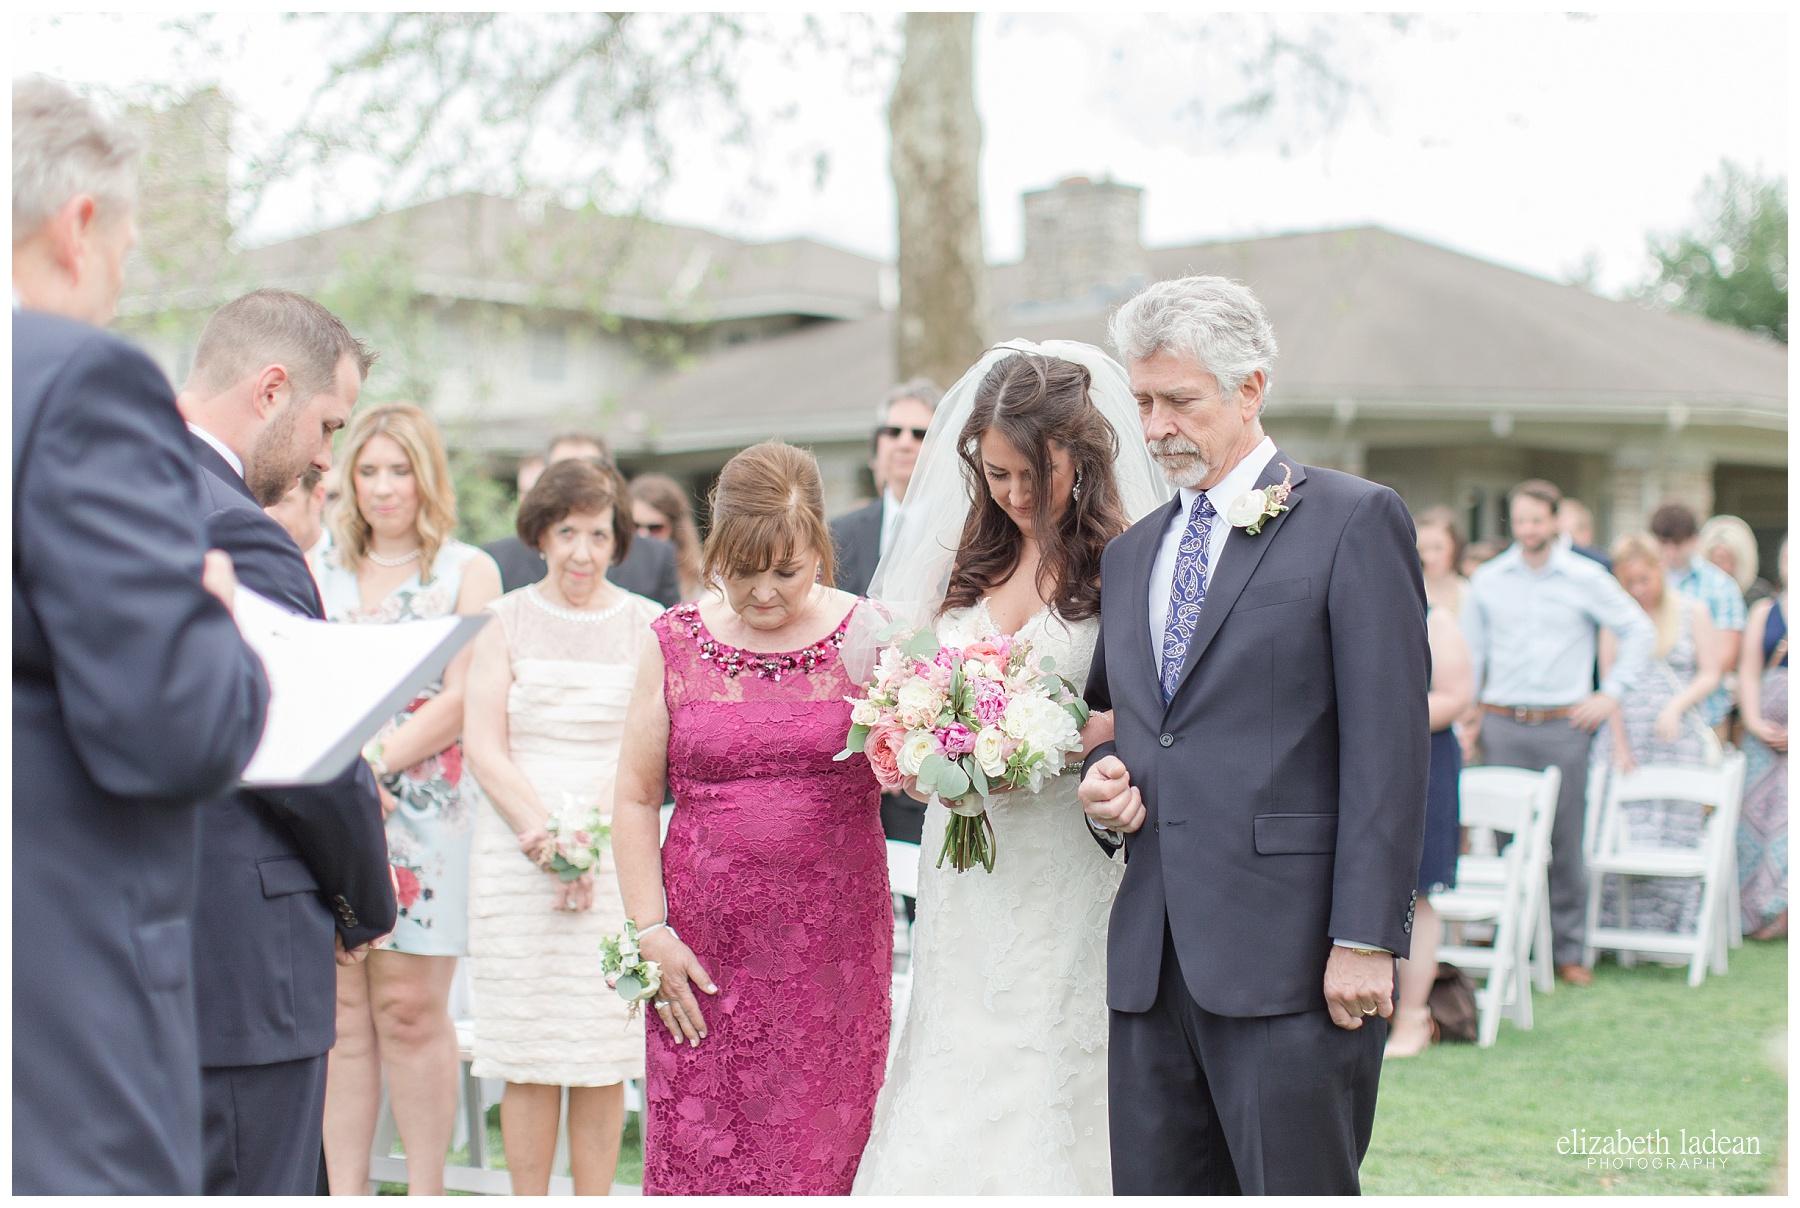 Hillcrest-Country-Club-Kansas-City-Wedding-Photography-E+J-0520-Elizabeth-Ladean-Photography-photo_0837.jpg